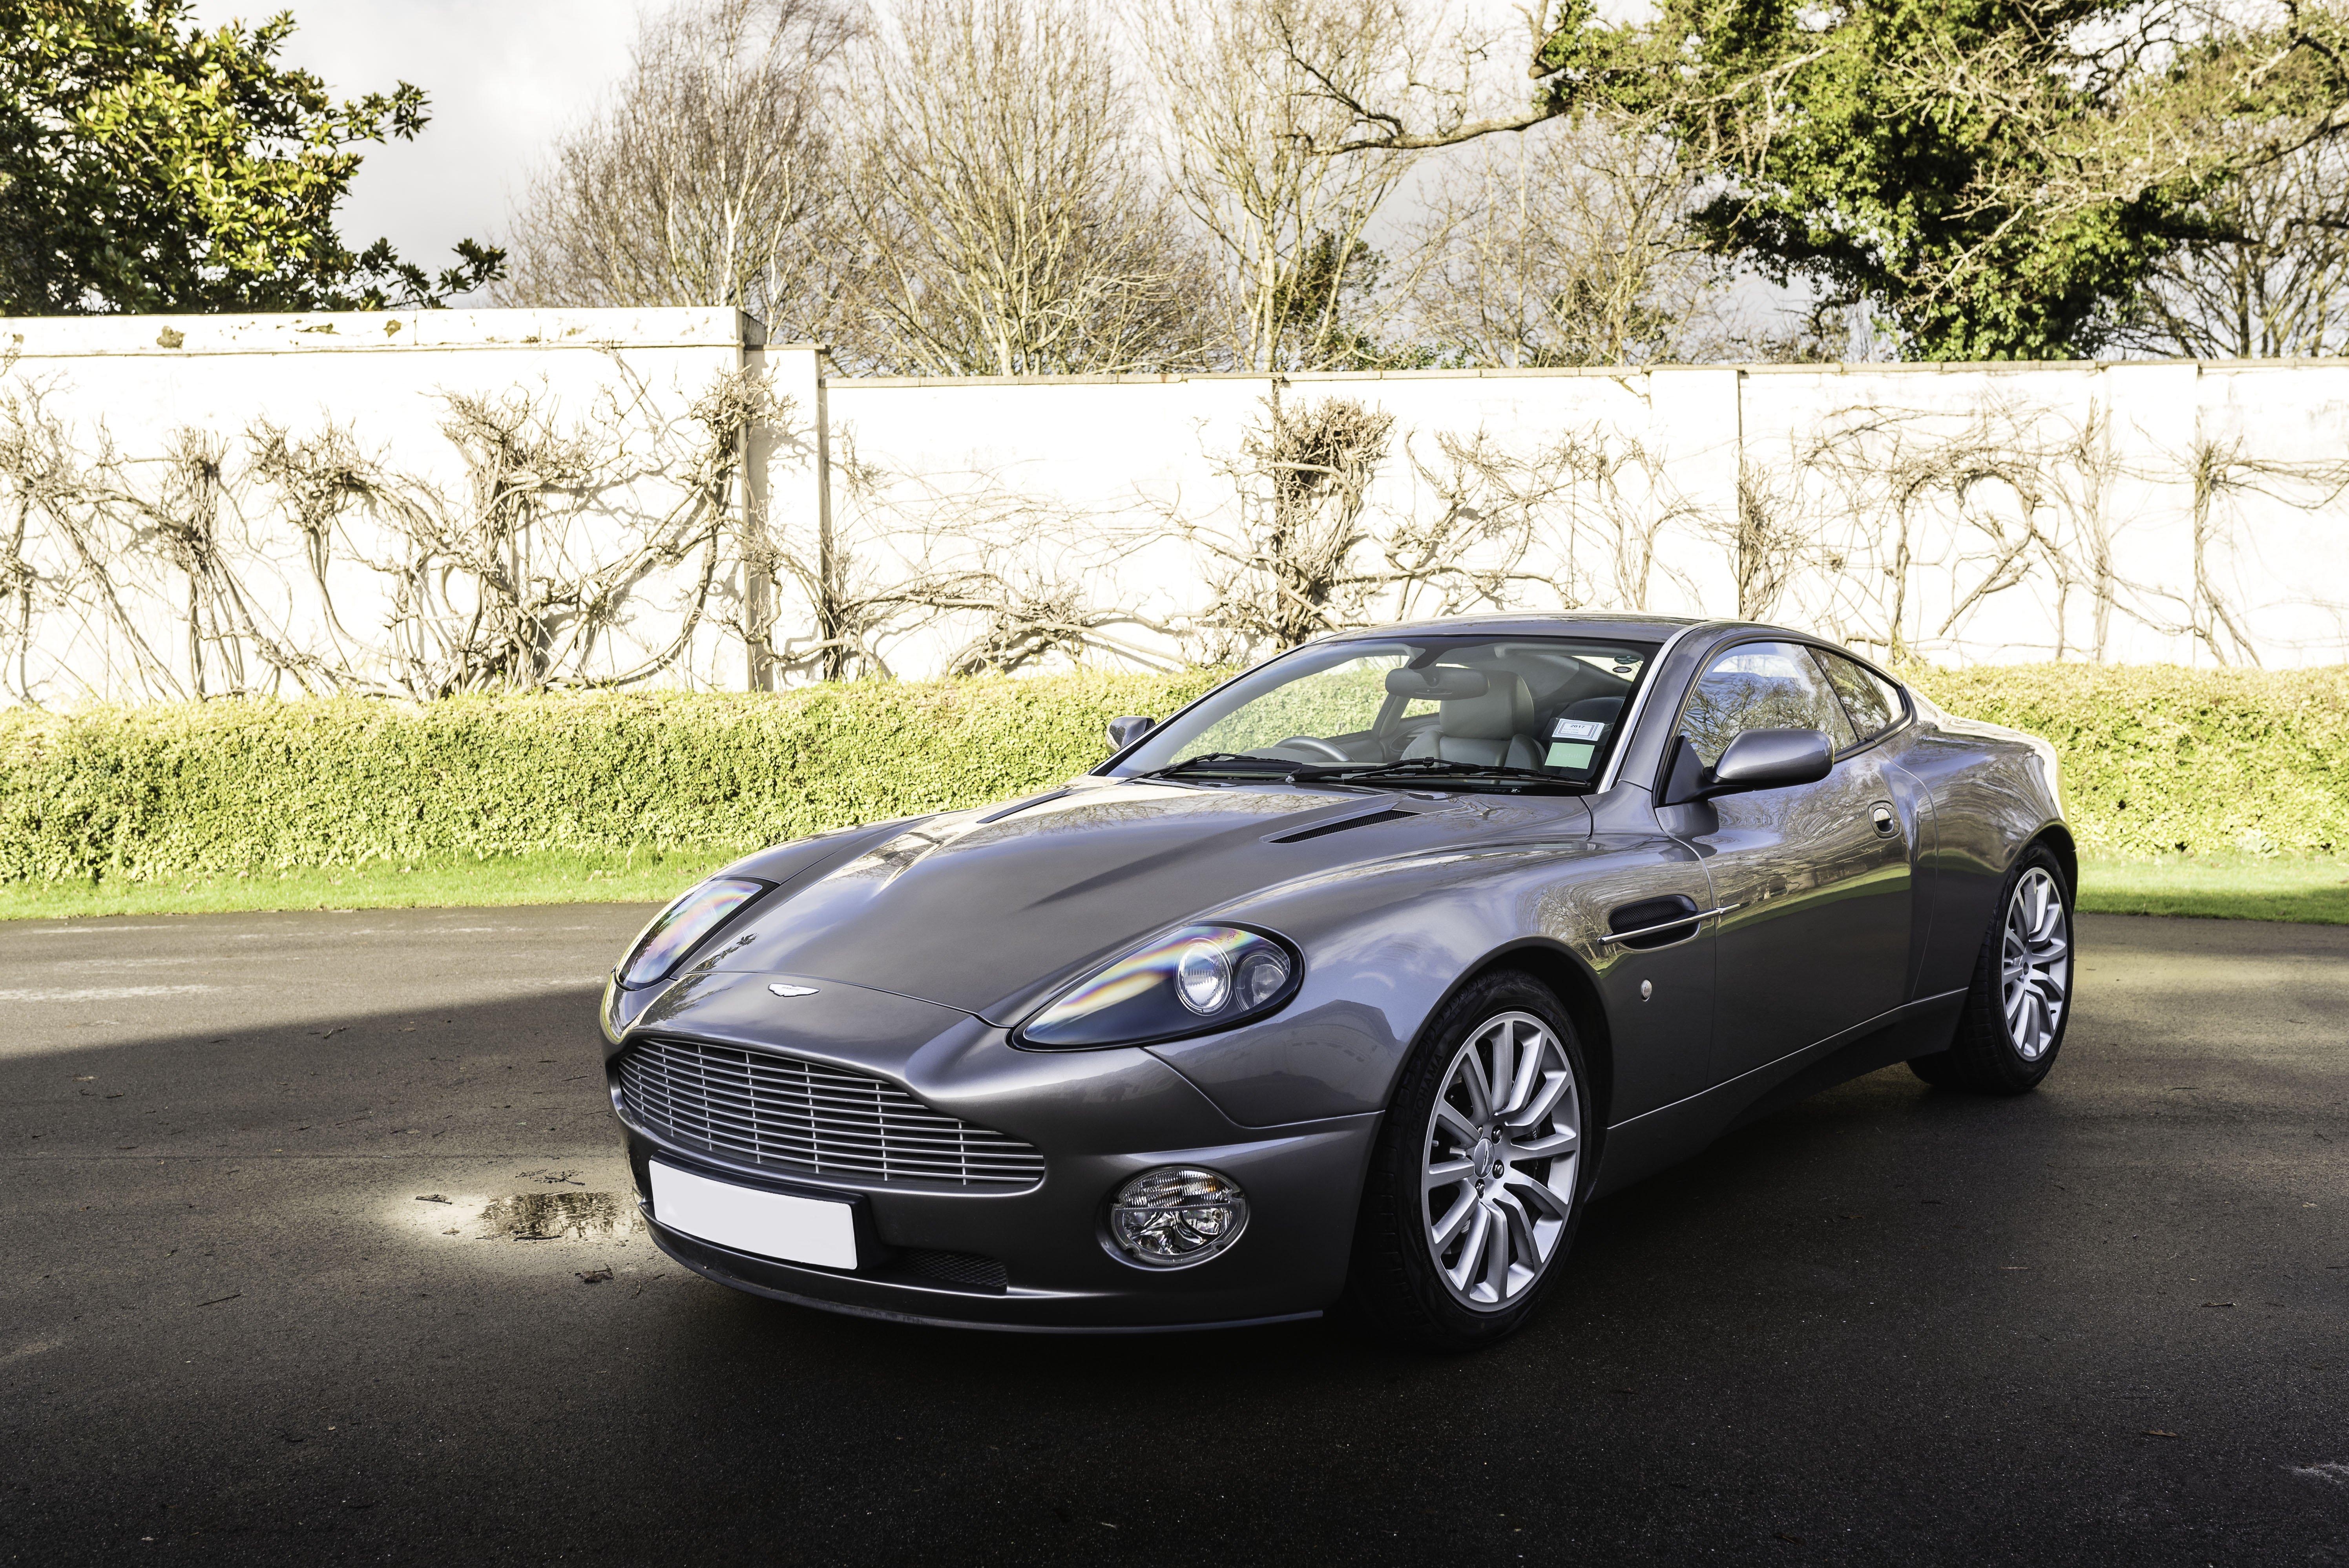 2003 Aston Martin Vanquish 2 2 Rhd Recent Major Mechanical Overhaul Classic Driver Market